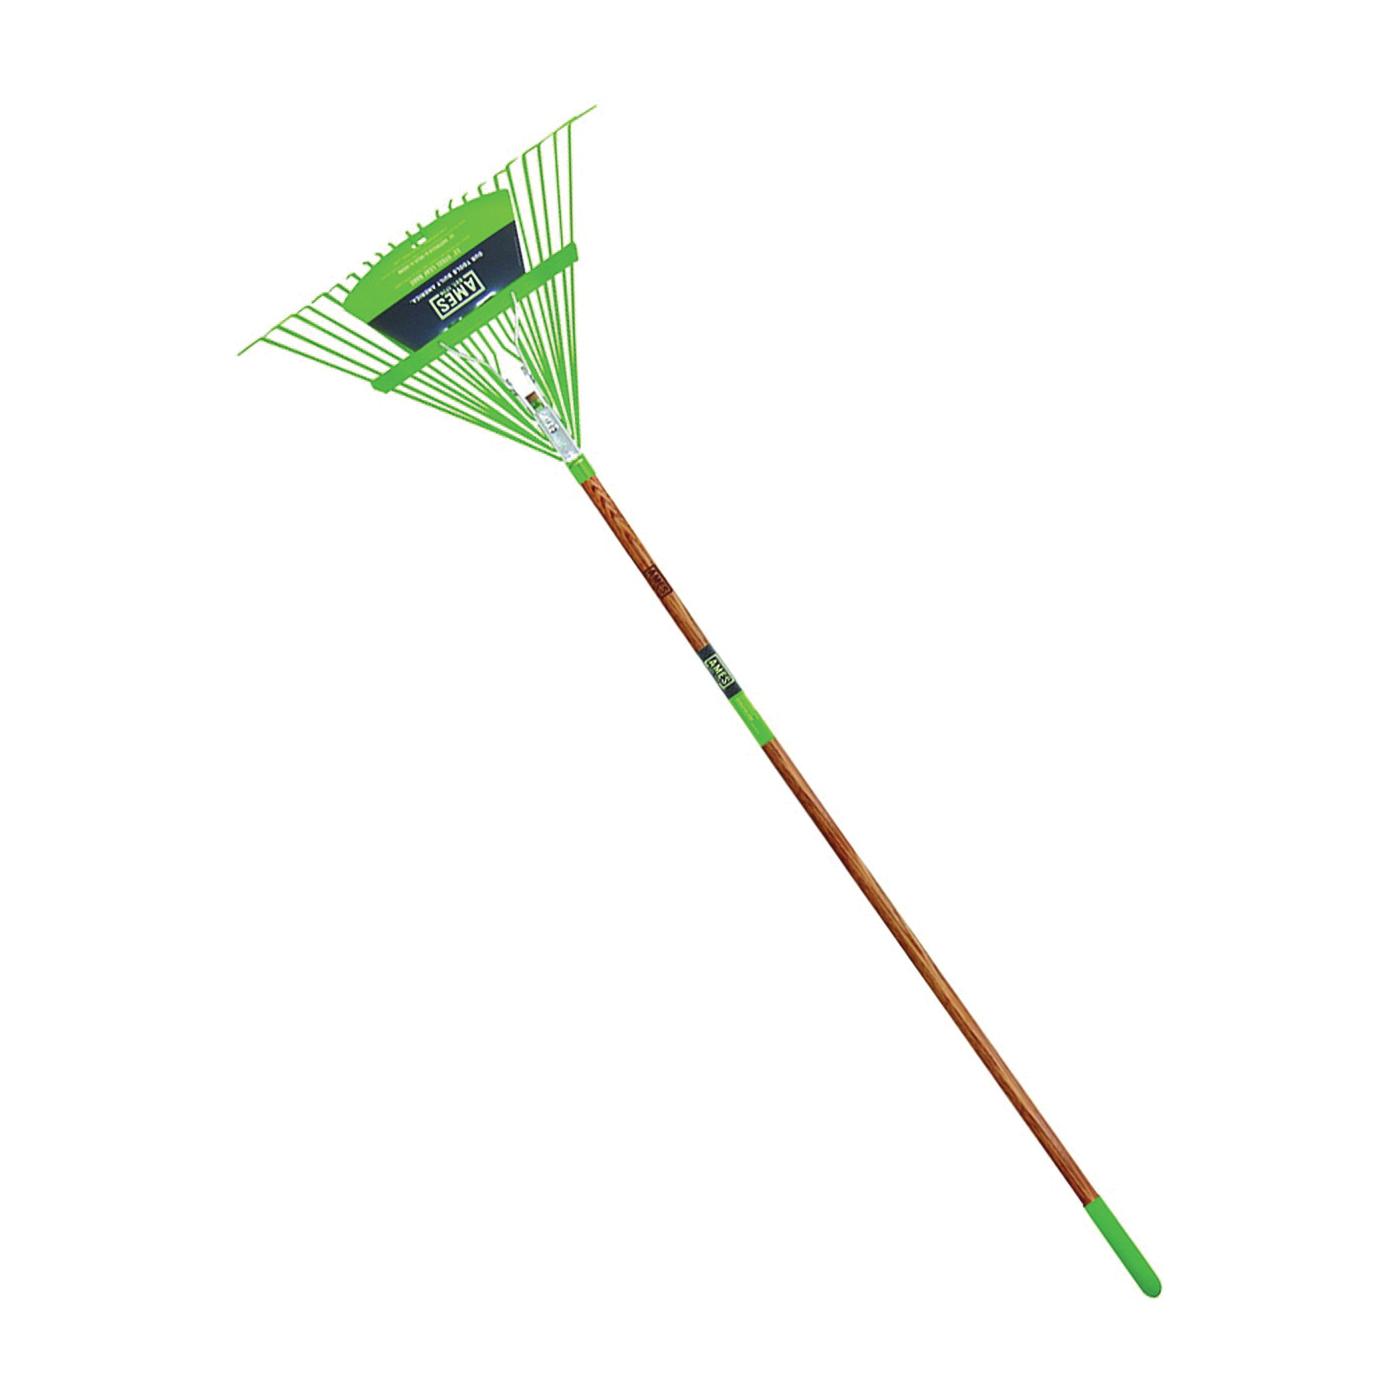 Picture of AMES 2915612 Leaf Rake, Steel Tine, 22 -Tine, Wood Handle